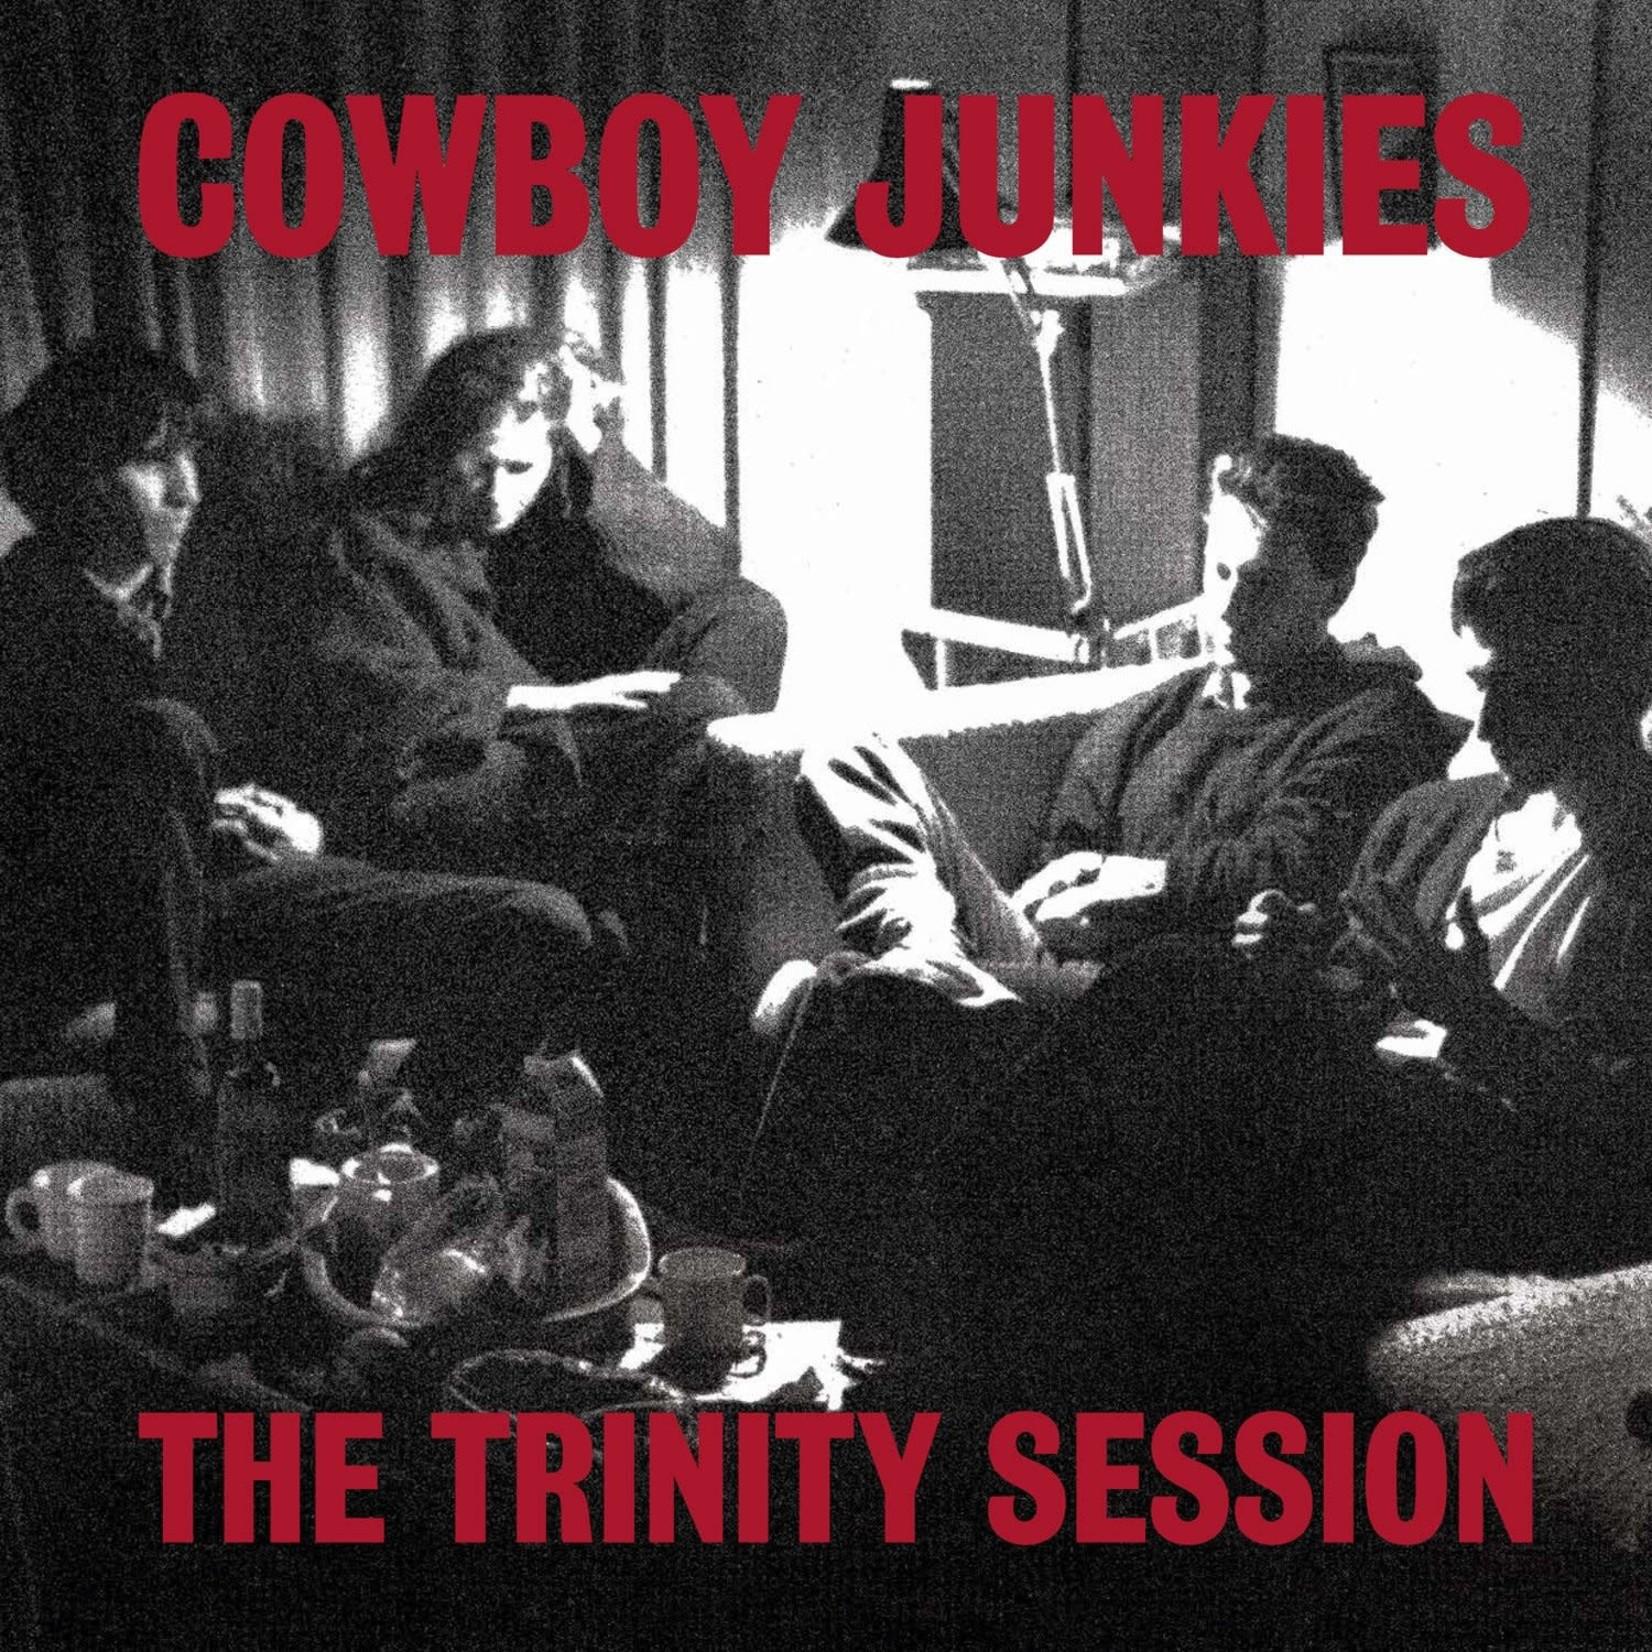 Vinyl Cowboy Junkies - The Trinity Session